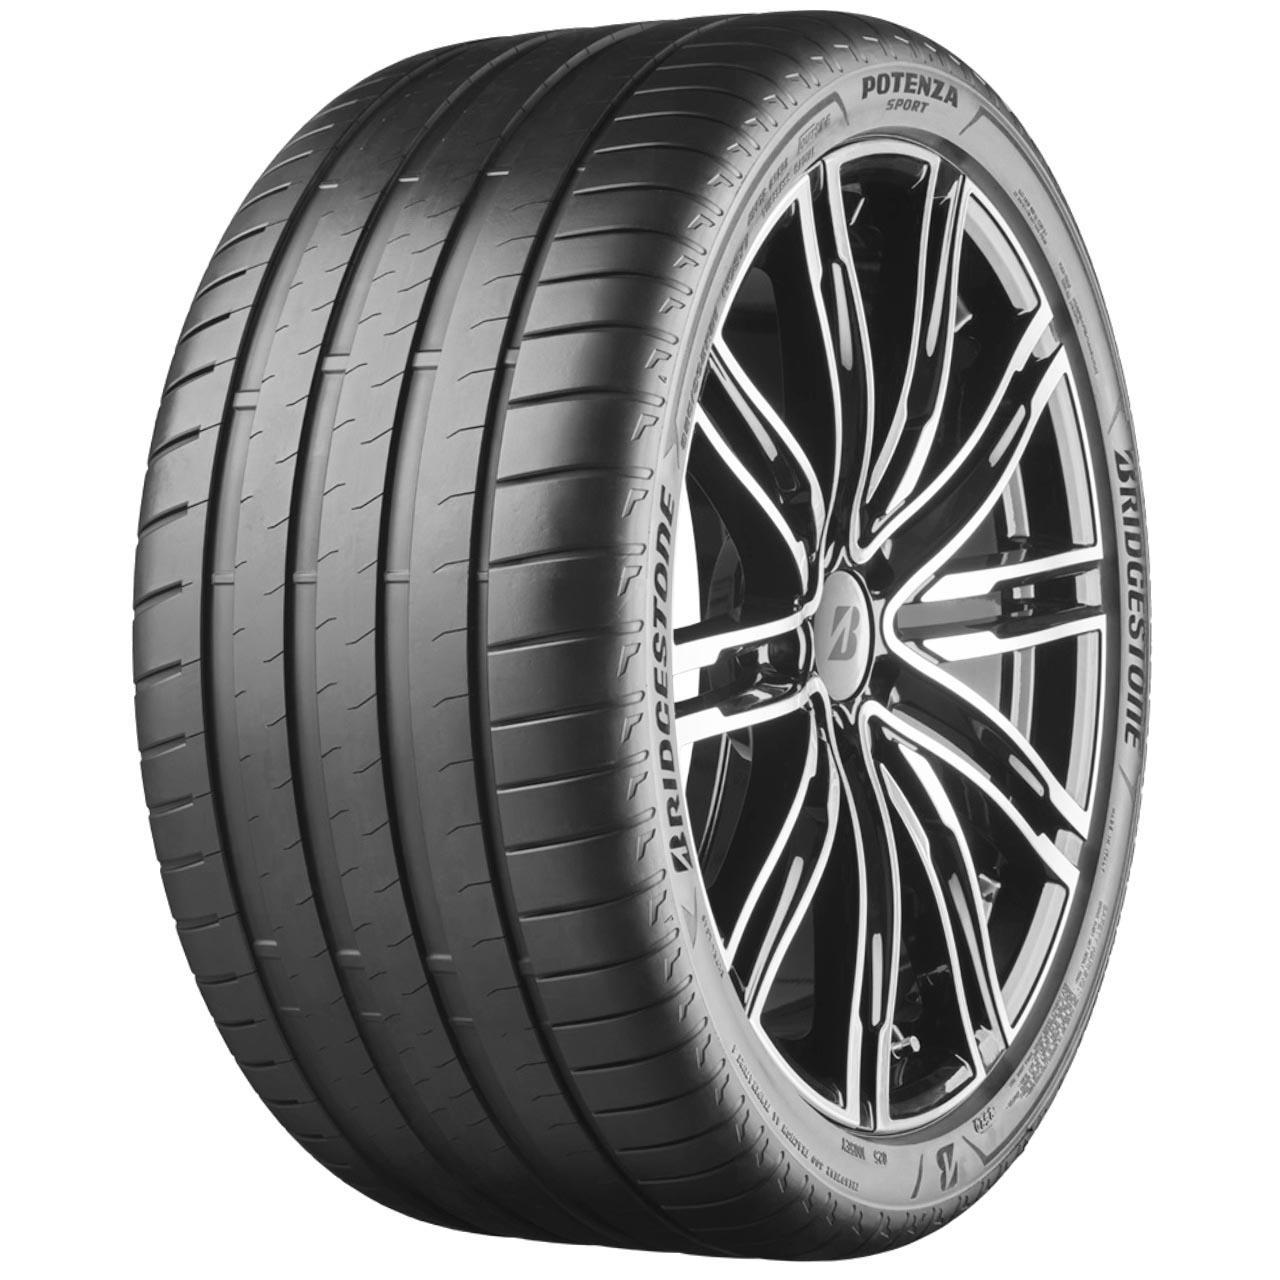 Bridgestone Potenza Sport 285/45R19 111Y XL MFS